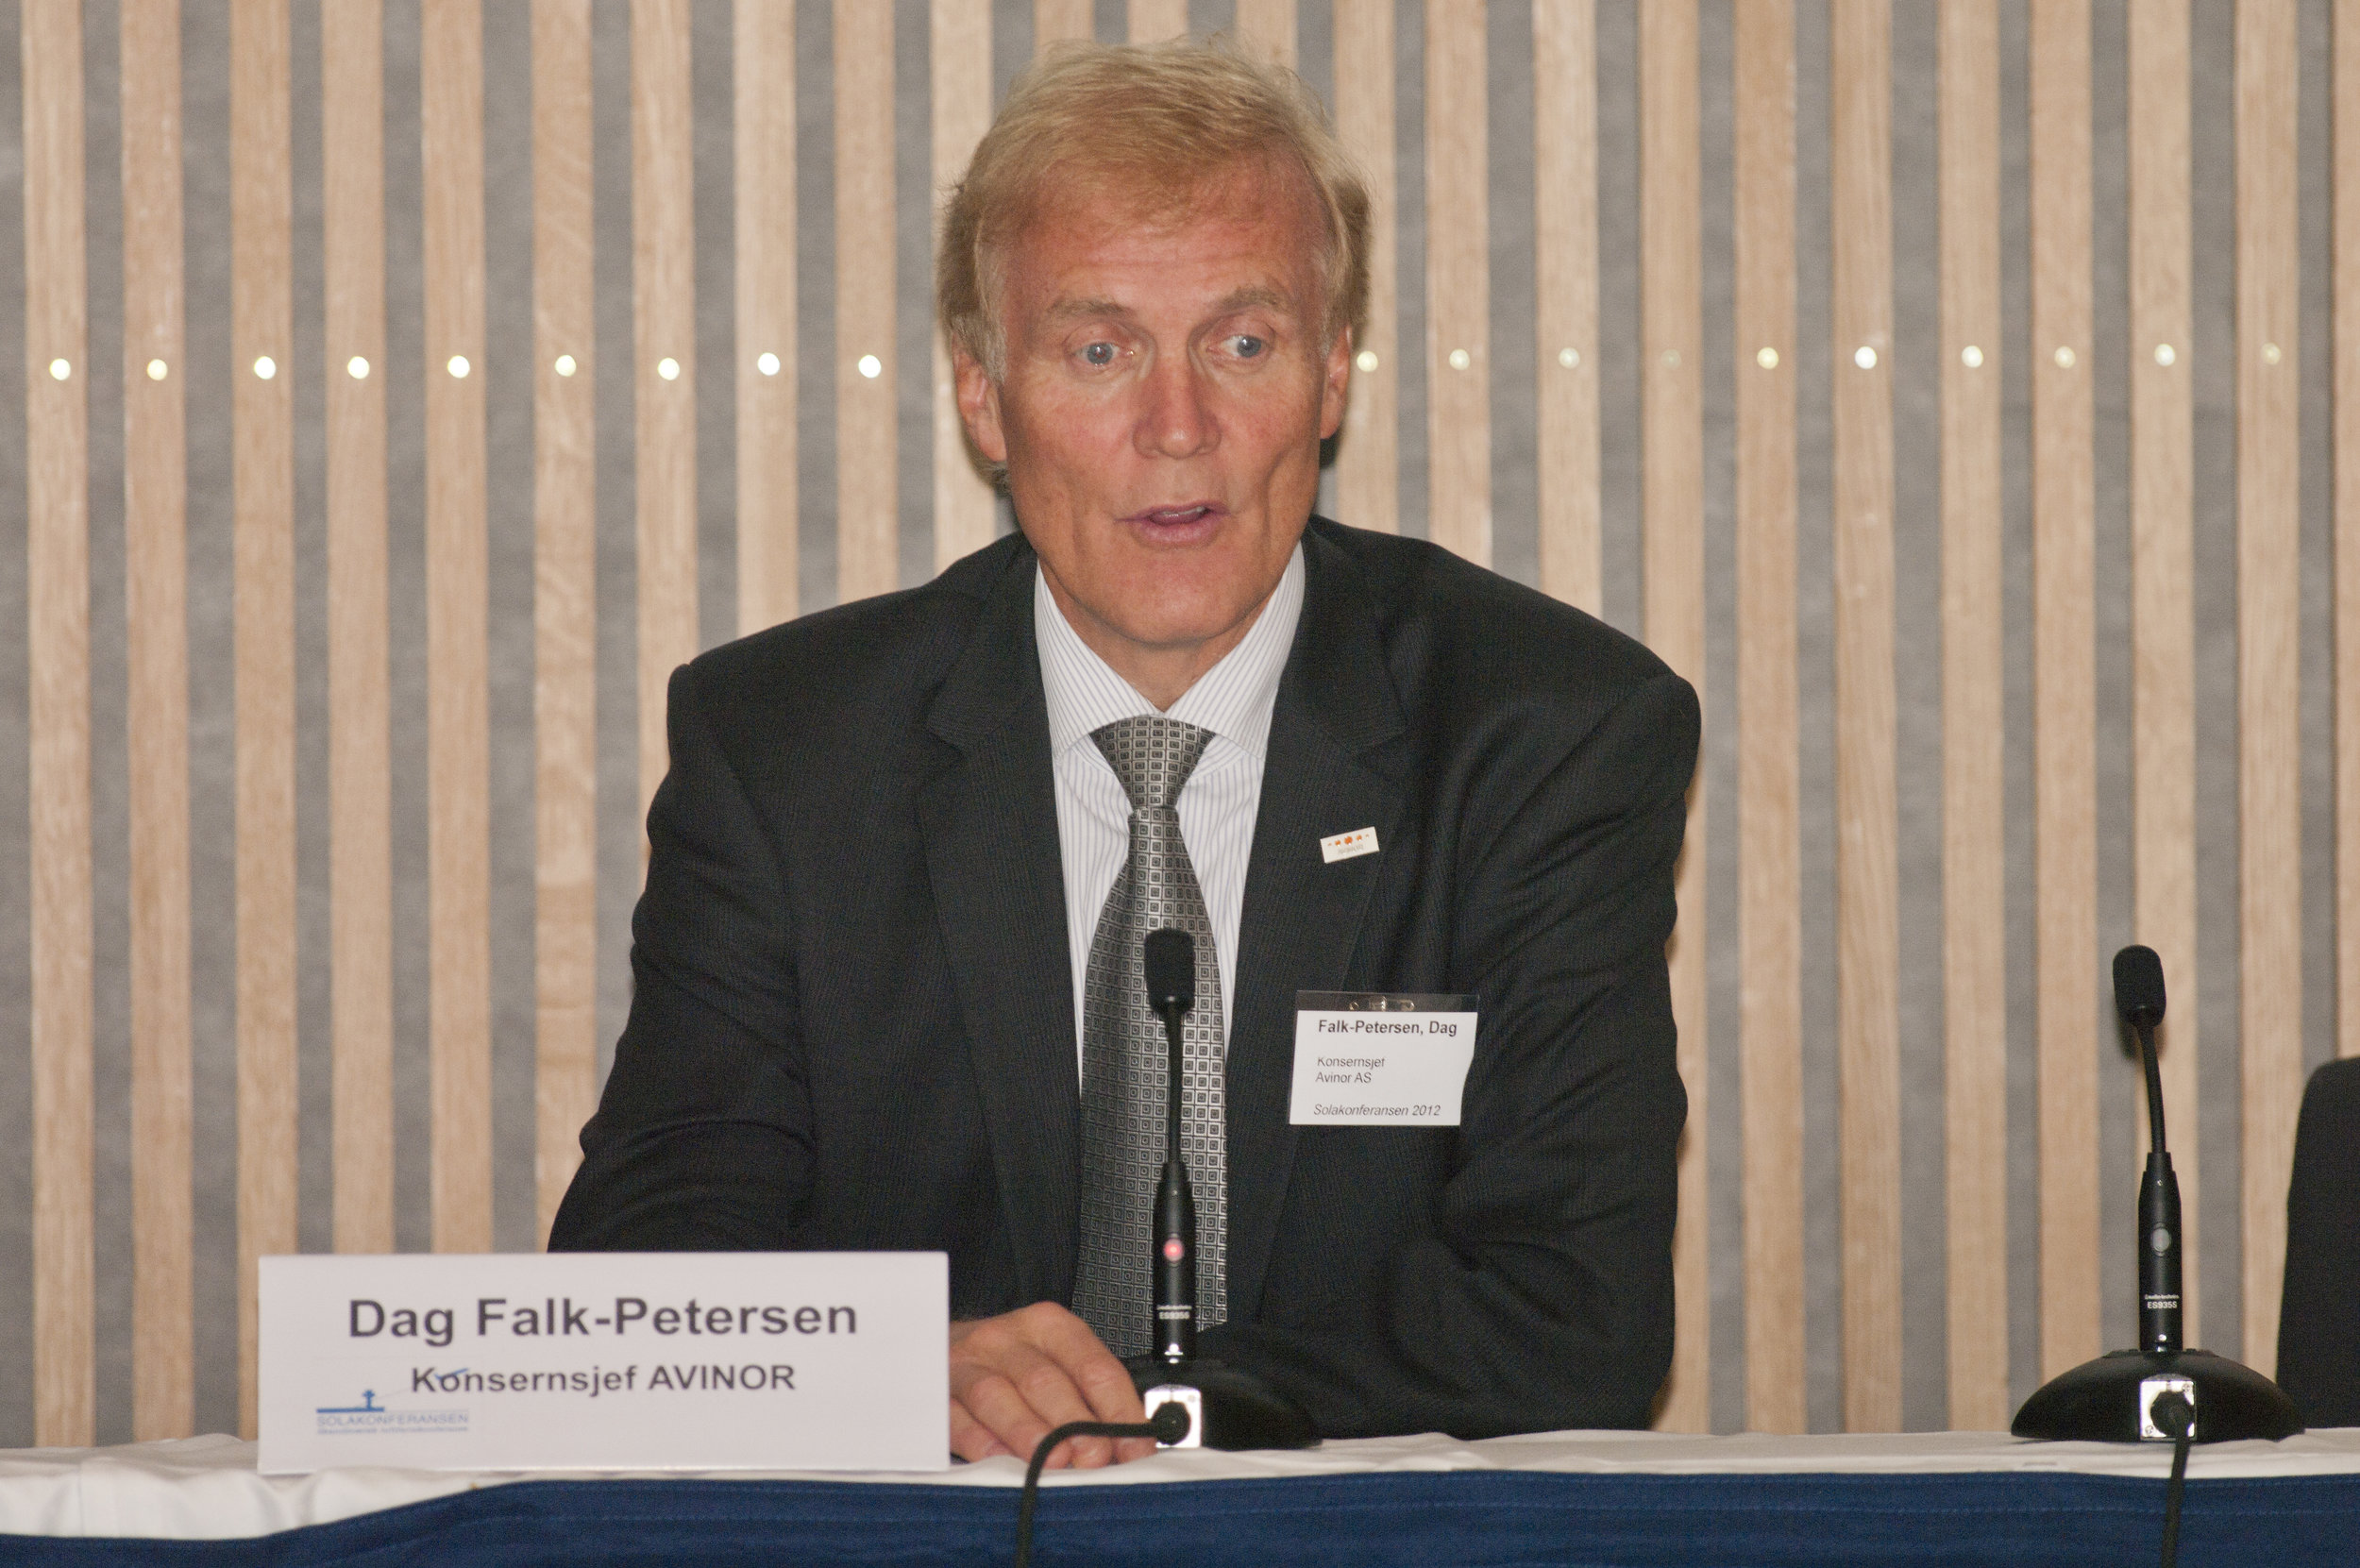 Falk-Petersen_6_svar (5).JPG